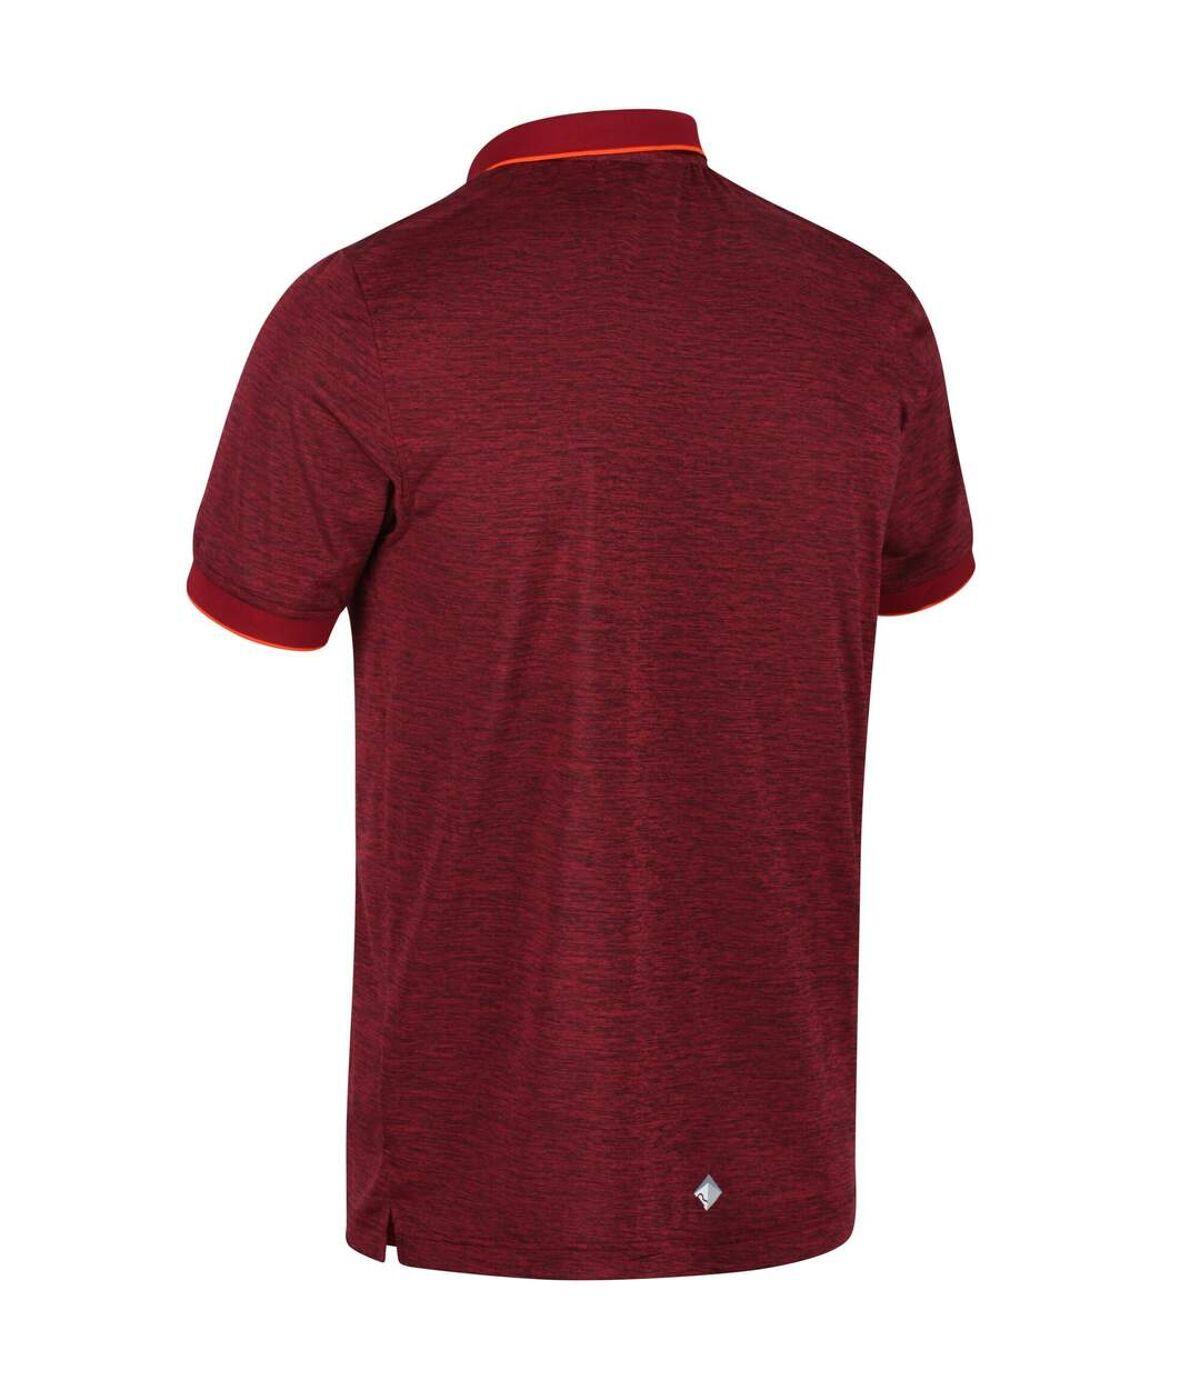 Regatta Mens Remex II Polo Shirt (Delhi Red) - UTRG4217